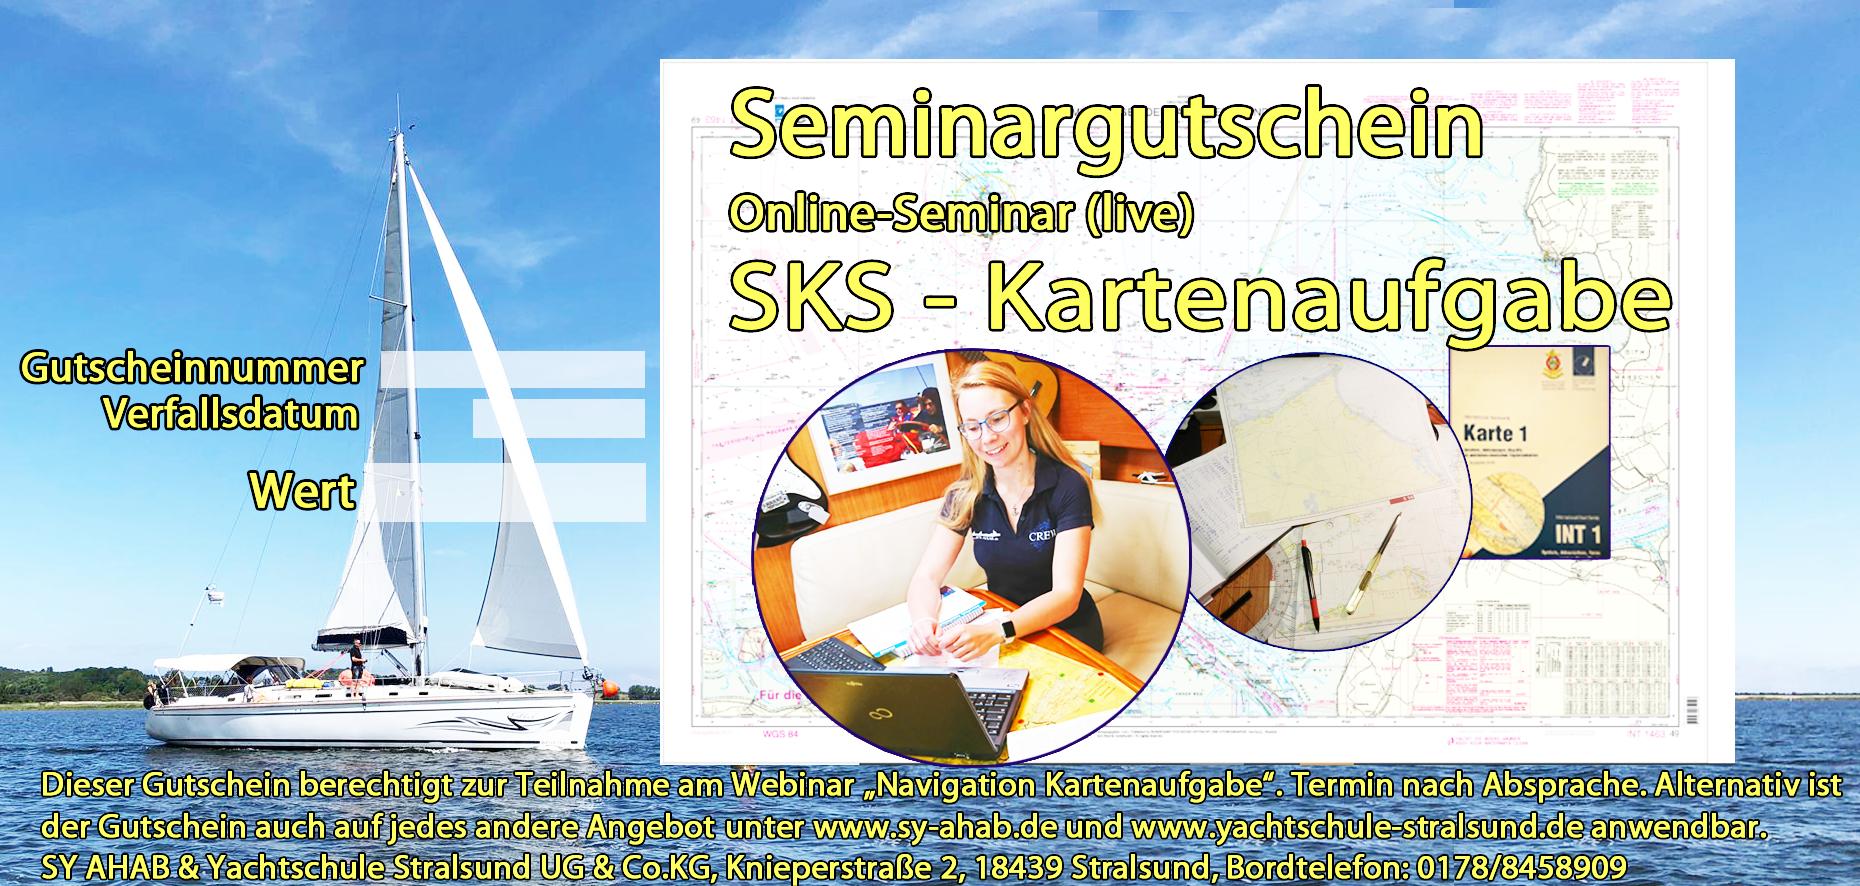 SKS NAvigation KArtenaufgabe Online Seminar Webinar